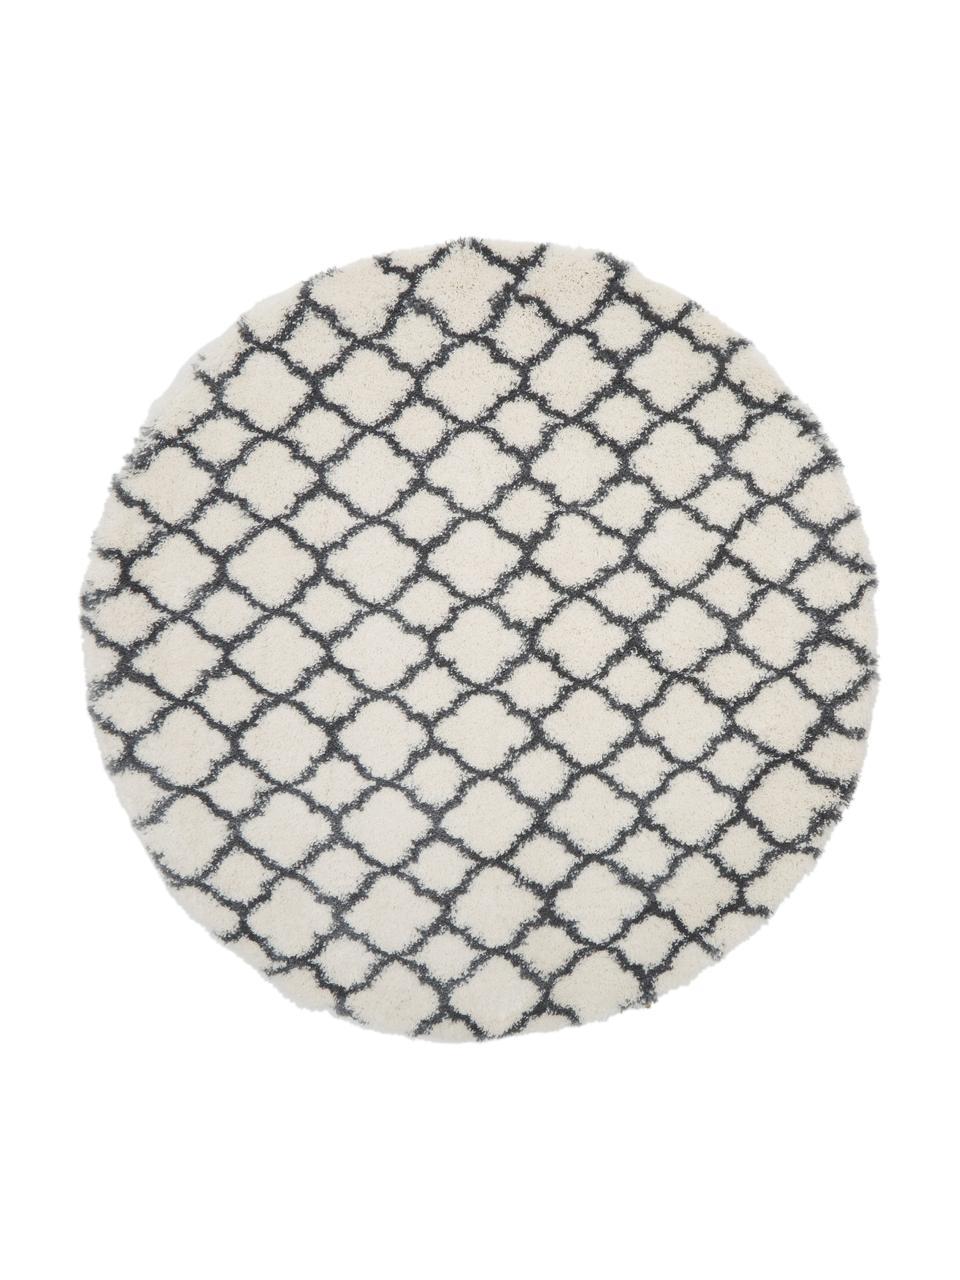 Hochflor-Teppich Mona in Cremeweiß/Dunkelgrau, Flor: 100% Polypropylen, Cremeweiß, Dunkelgrau, Ø 150 cm (Größe M)